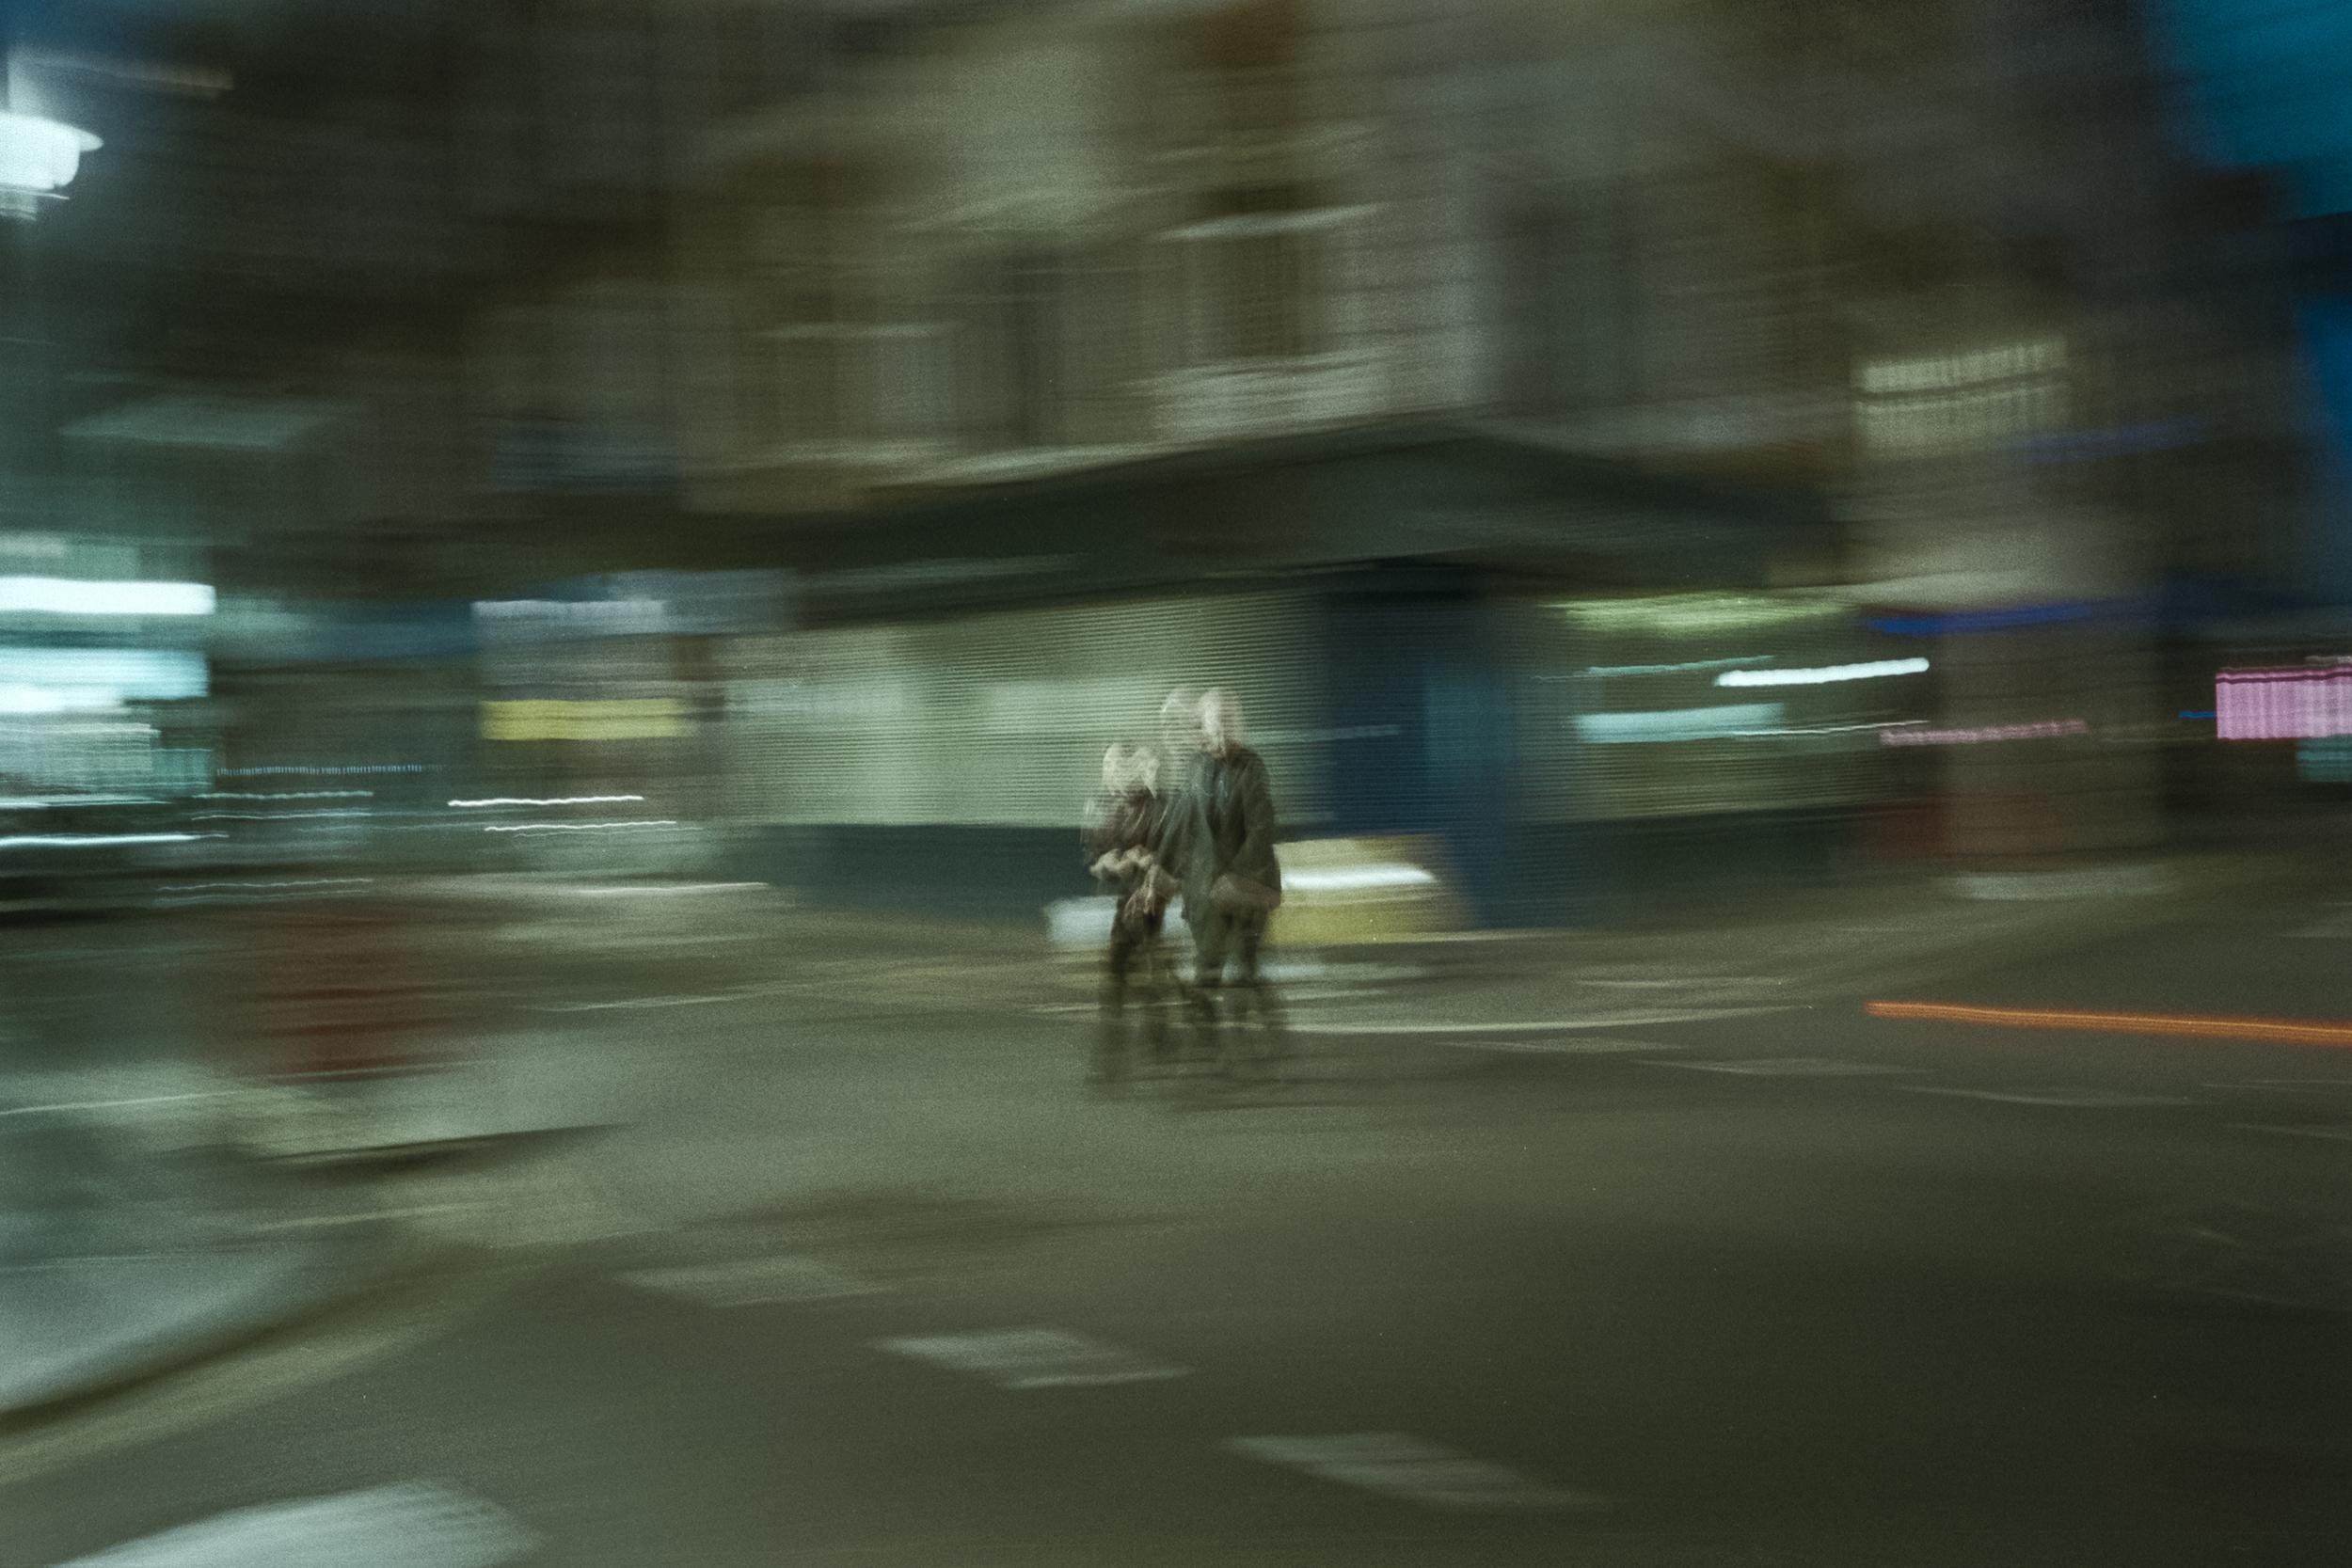 Oscar-arribas-photography-fotografo-portrait-retrato-editorial-london-street-photography-urbana-londres-film-analog-35mm-night-nocturna-58.jpg